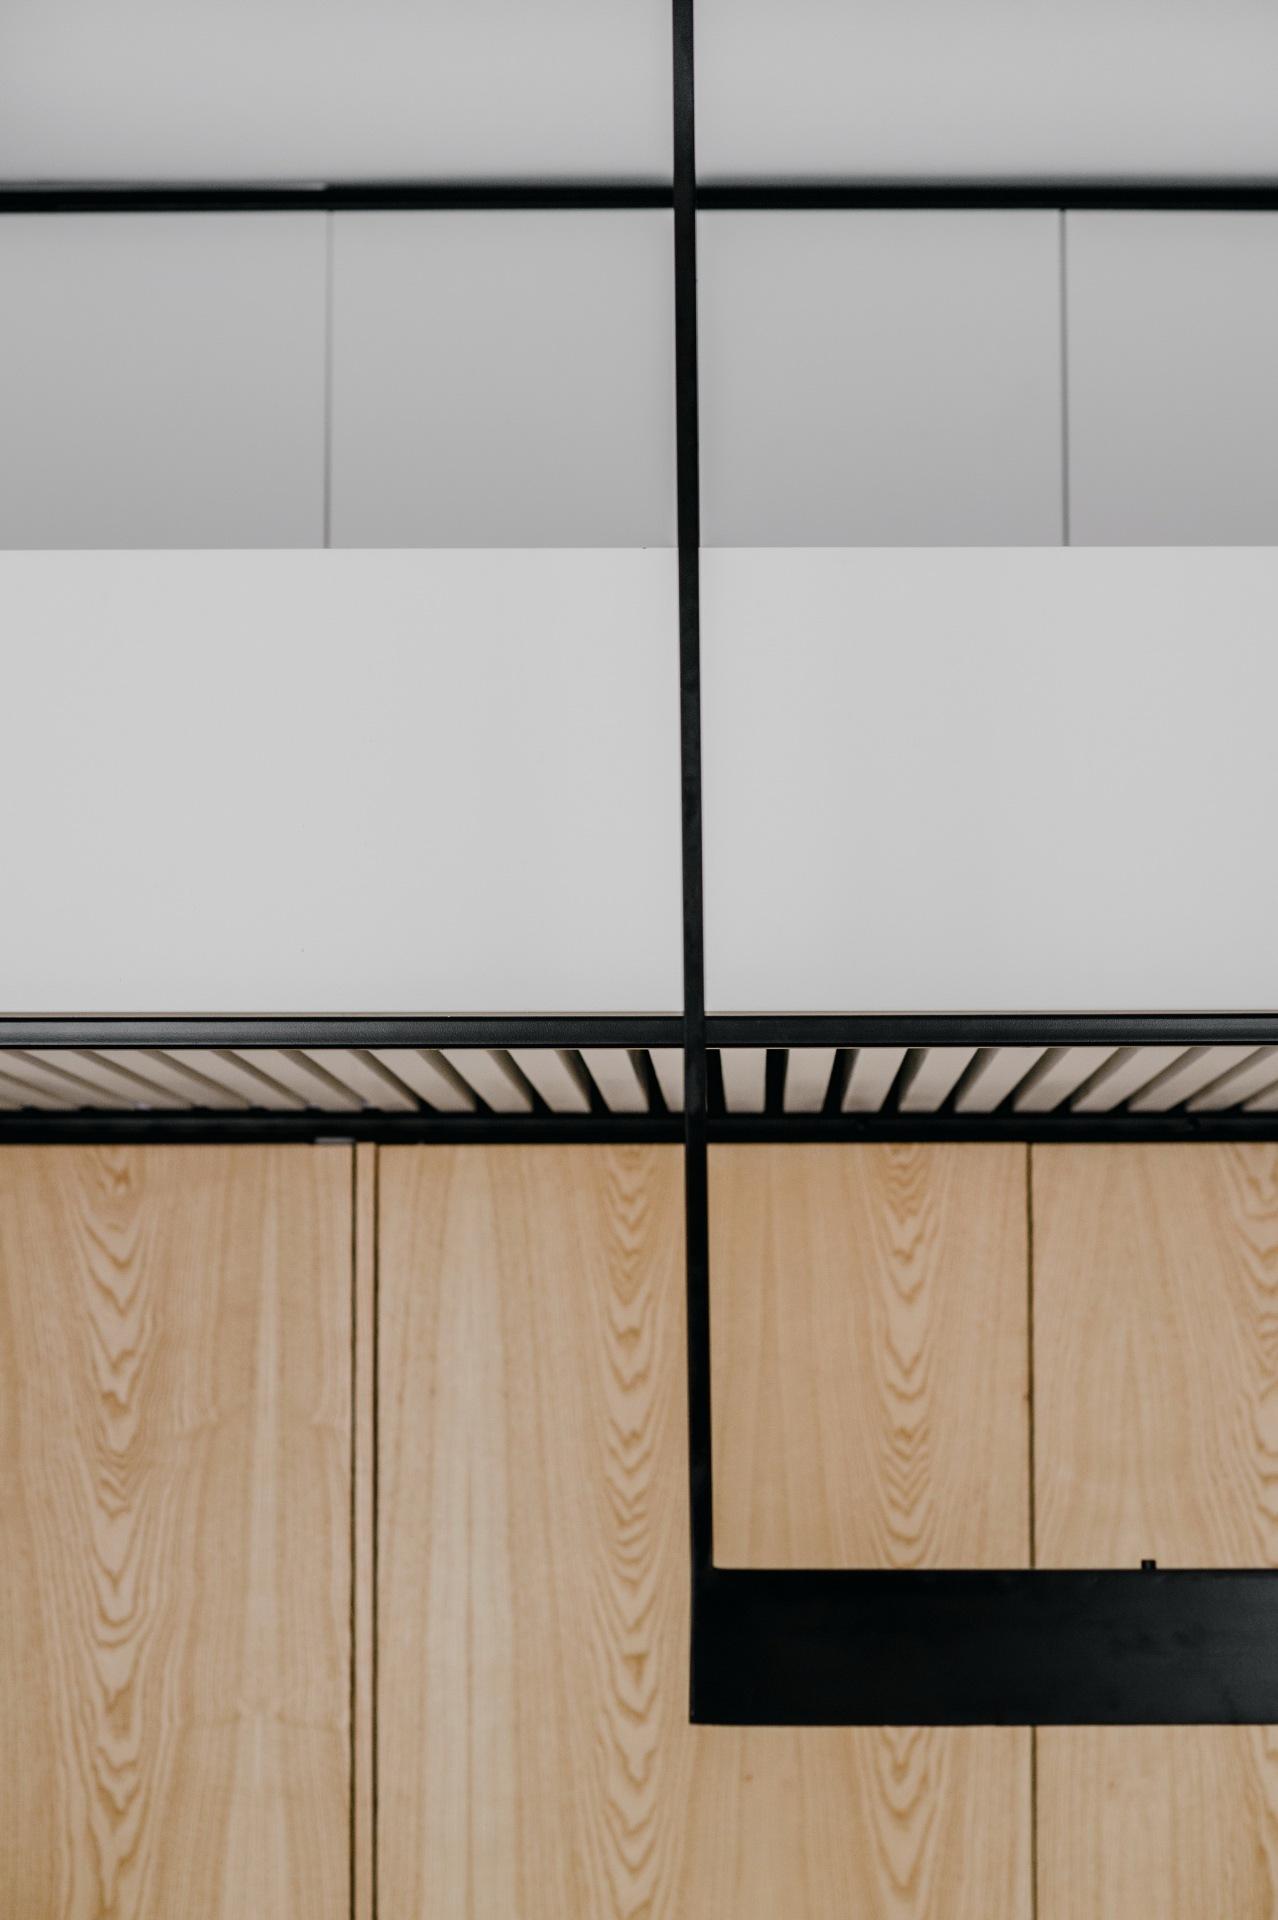 mus_architects_designalive-2